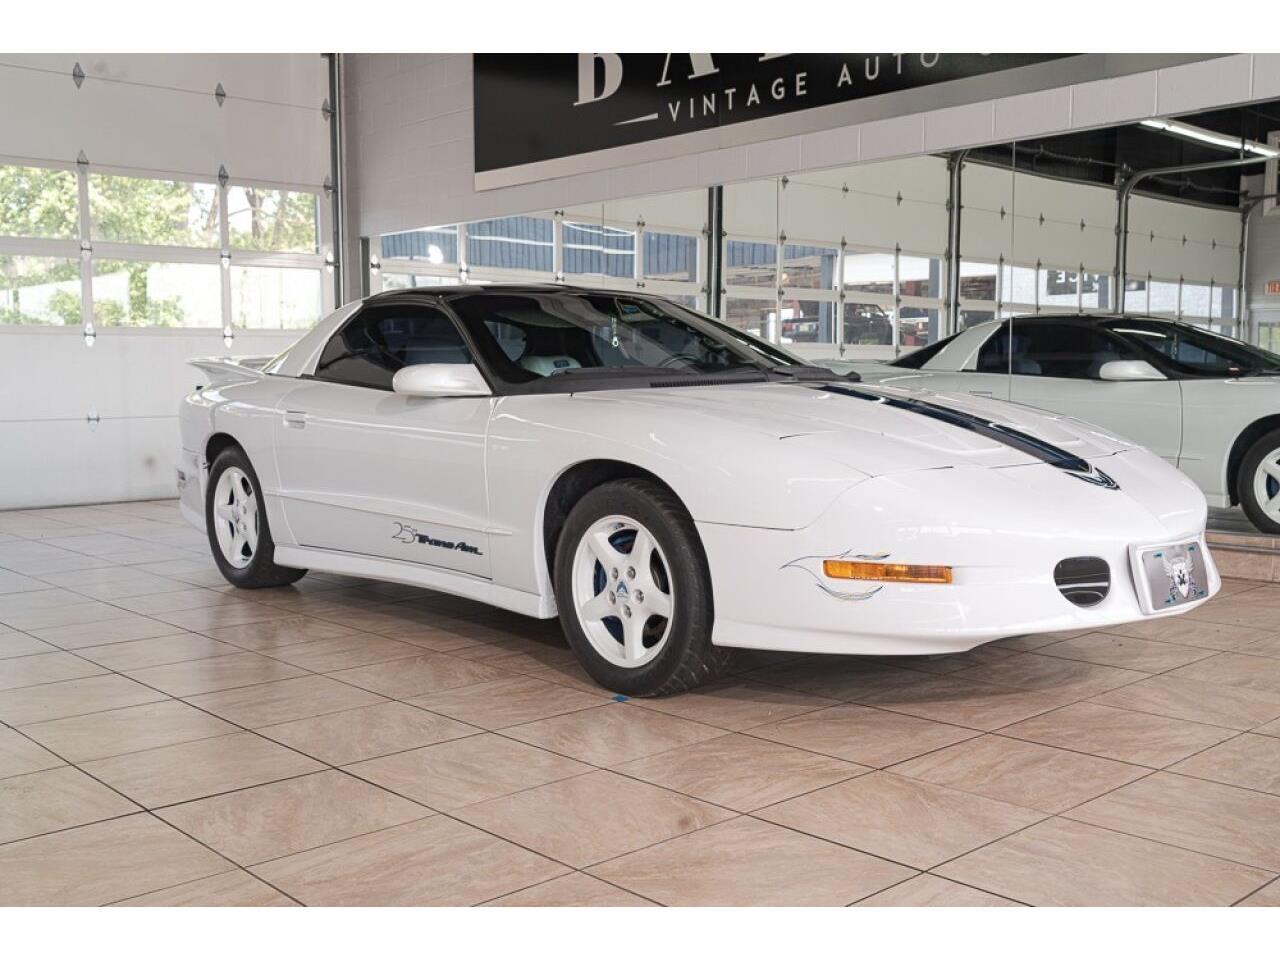 1994 Pontiac Firebird (CC-1440764) for sale in St. Charles, Illinois